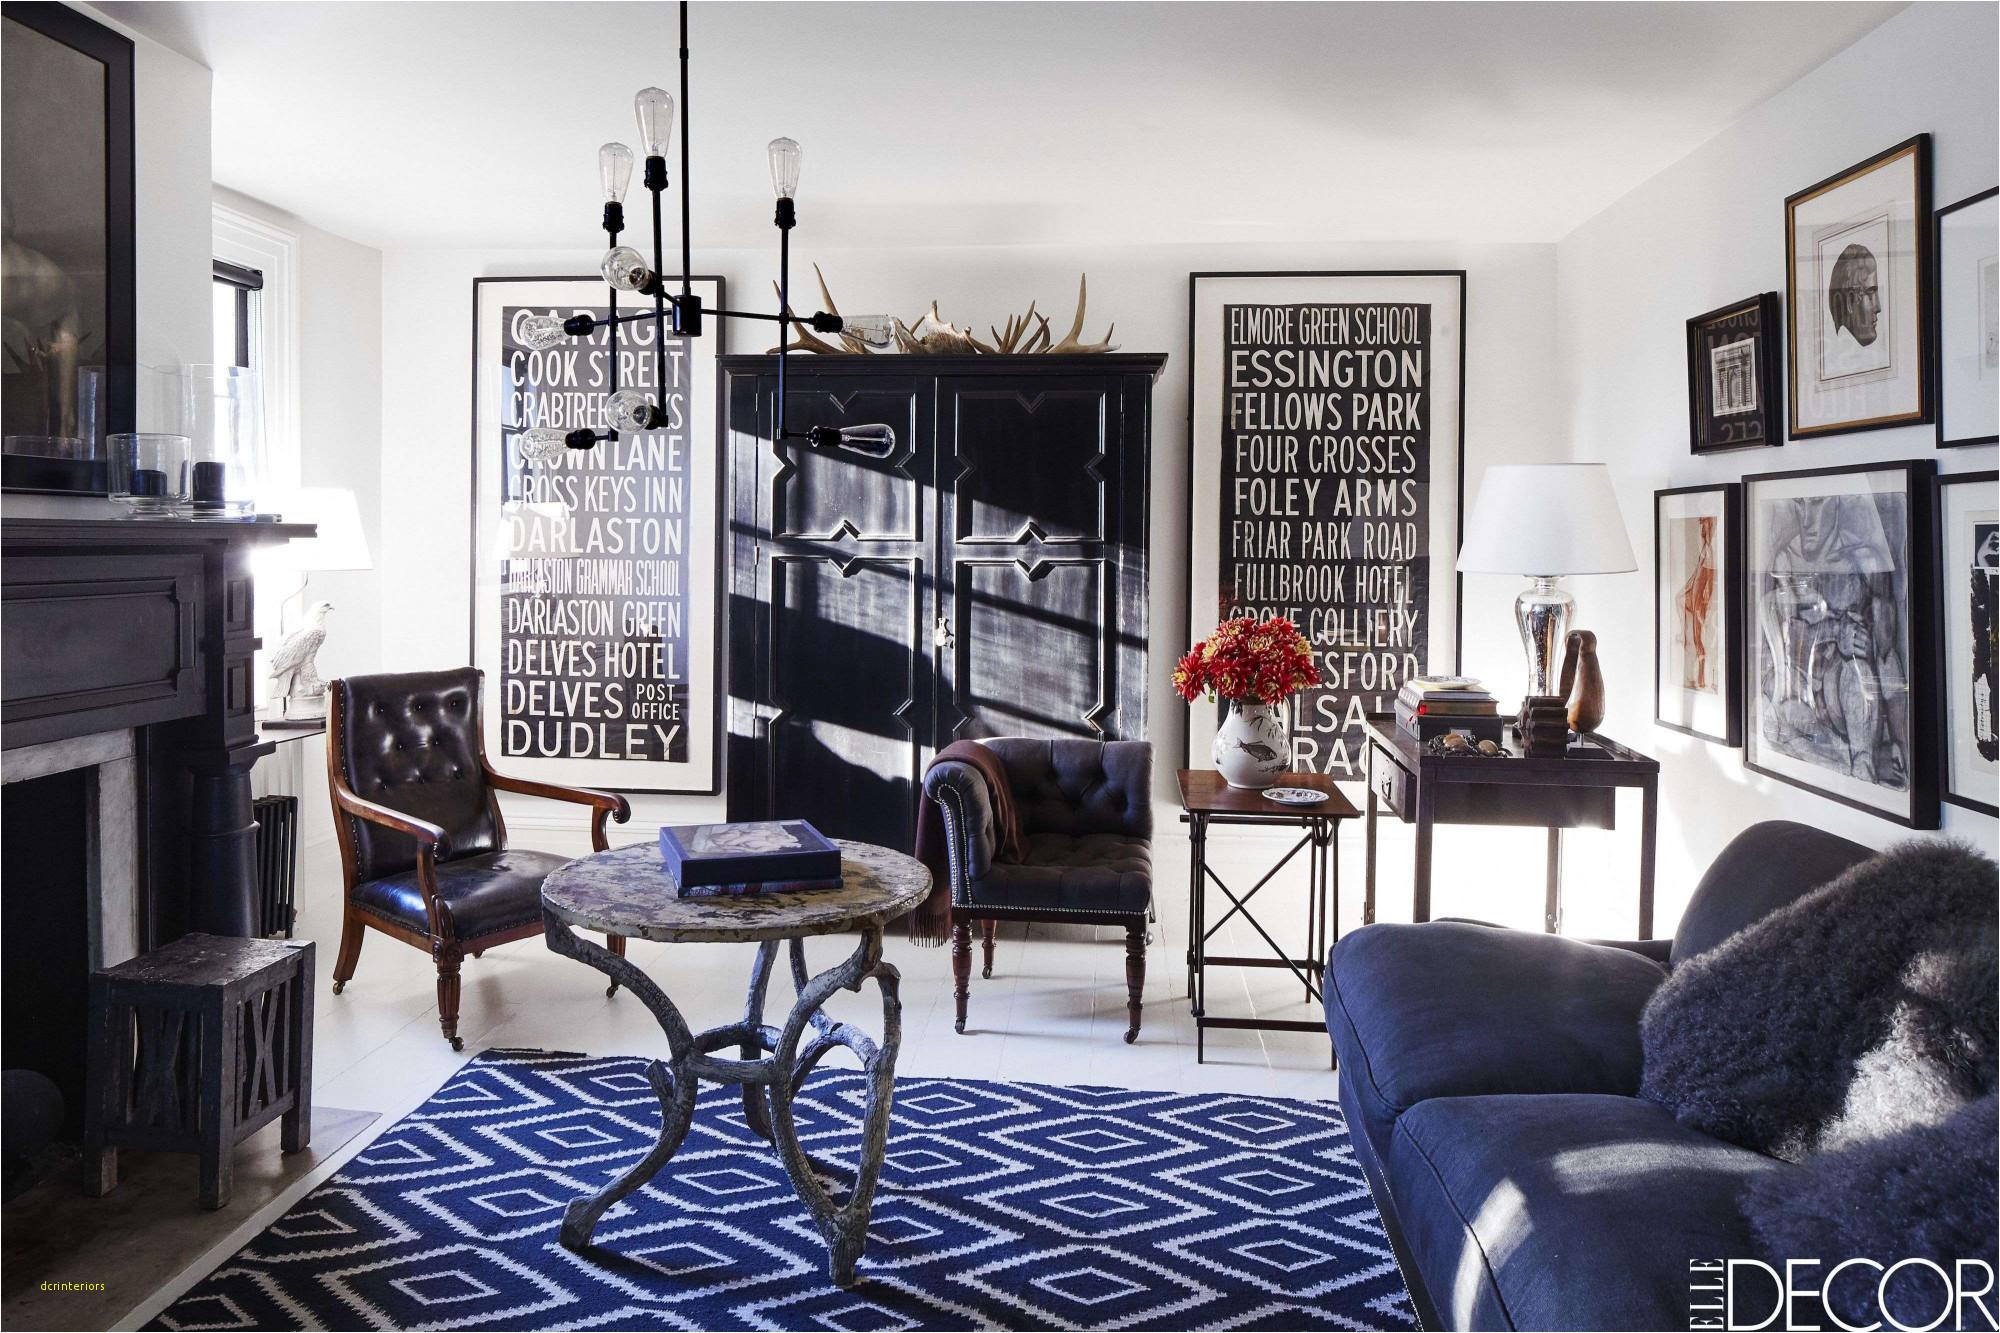 how much is hardwood floor installation cost of wood look porcelain tile best tile installation cost 50 unique wood regarding 24 terrific interior design ideas portrait